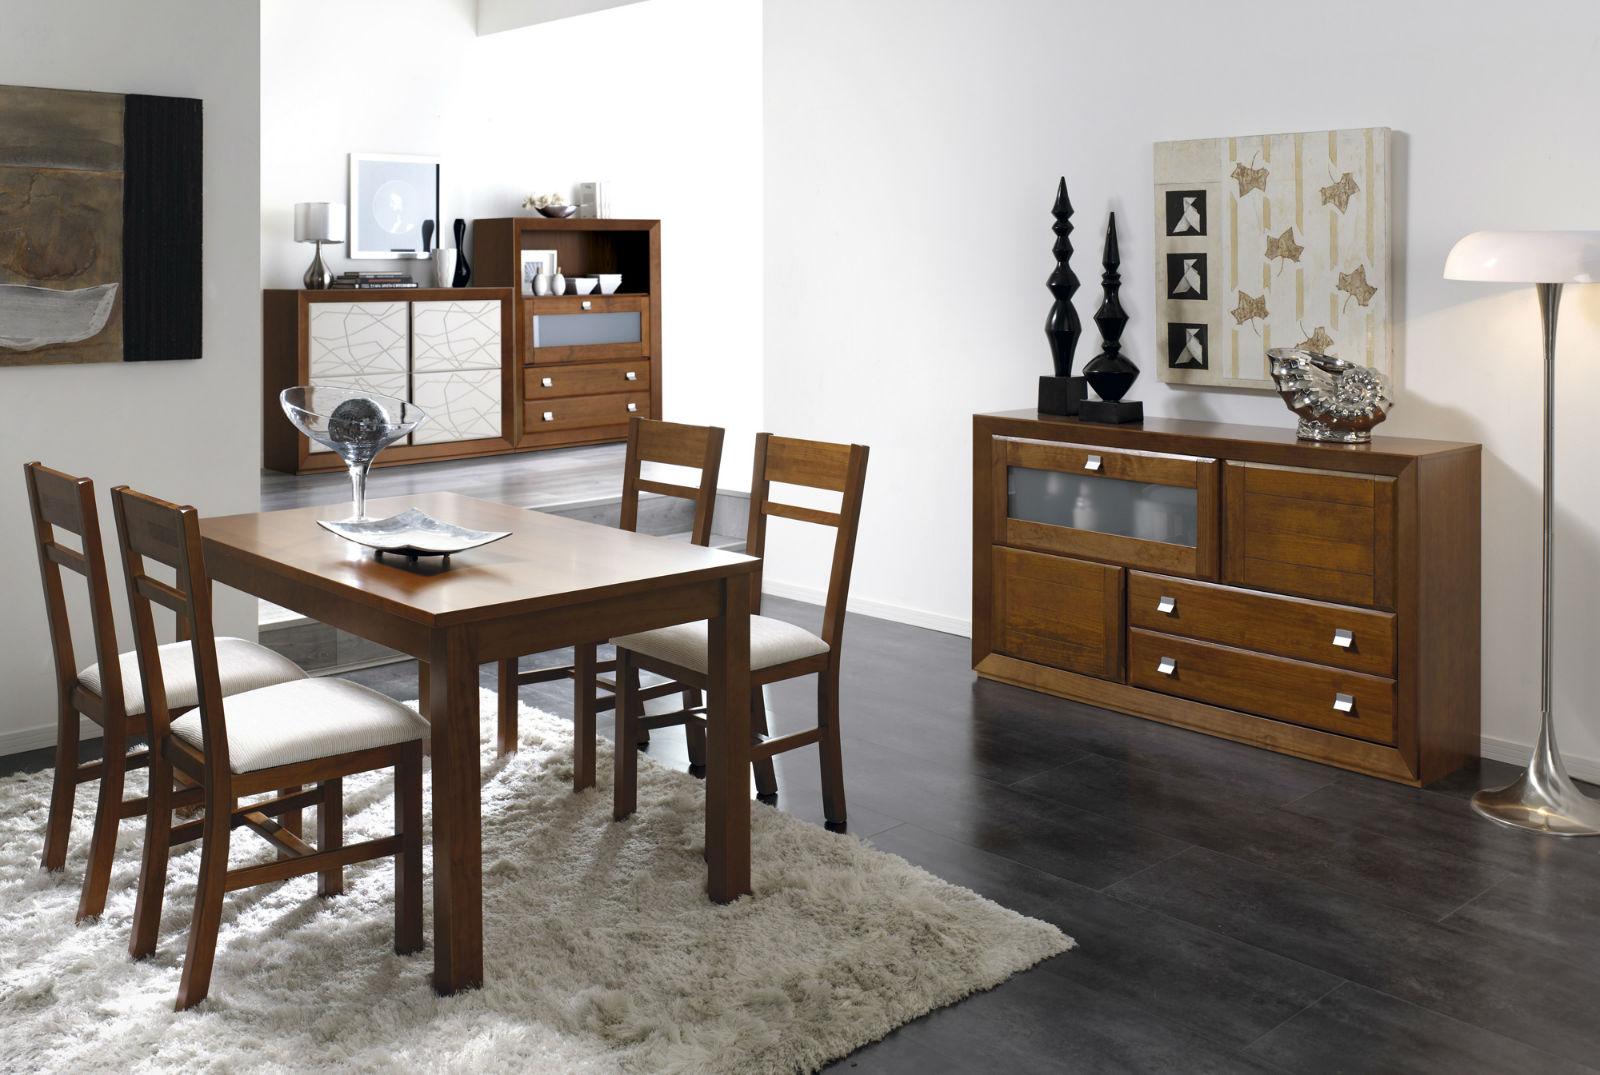 Muebles almer a muebles abrucena muebles baratos for Comedores de terraza baratos